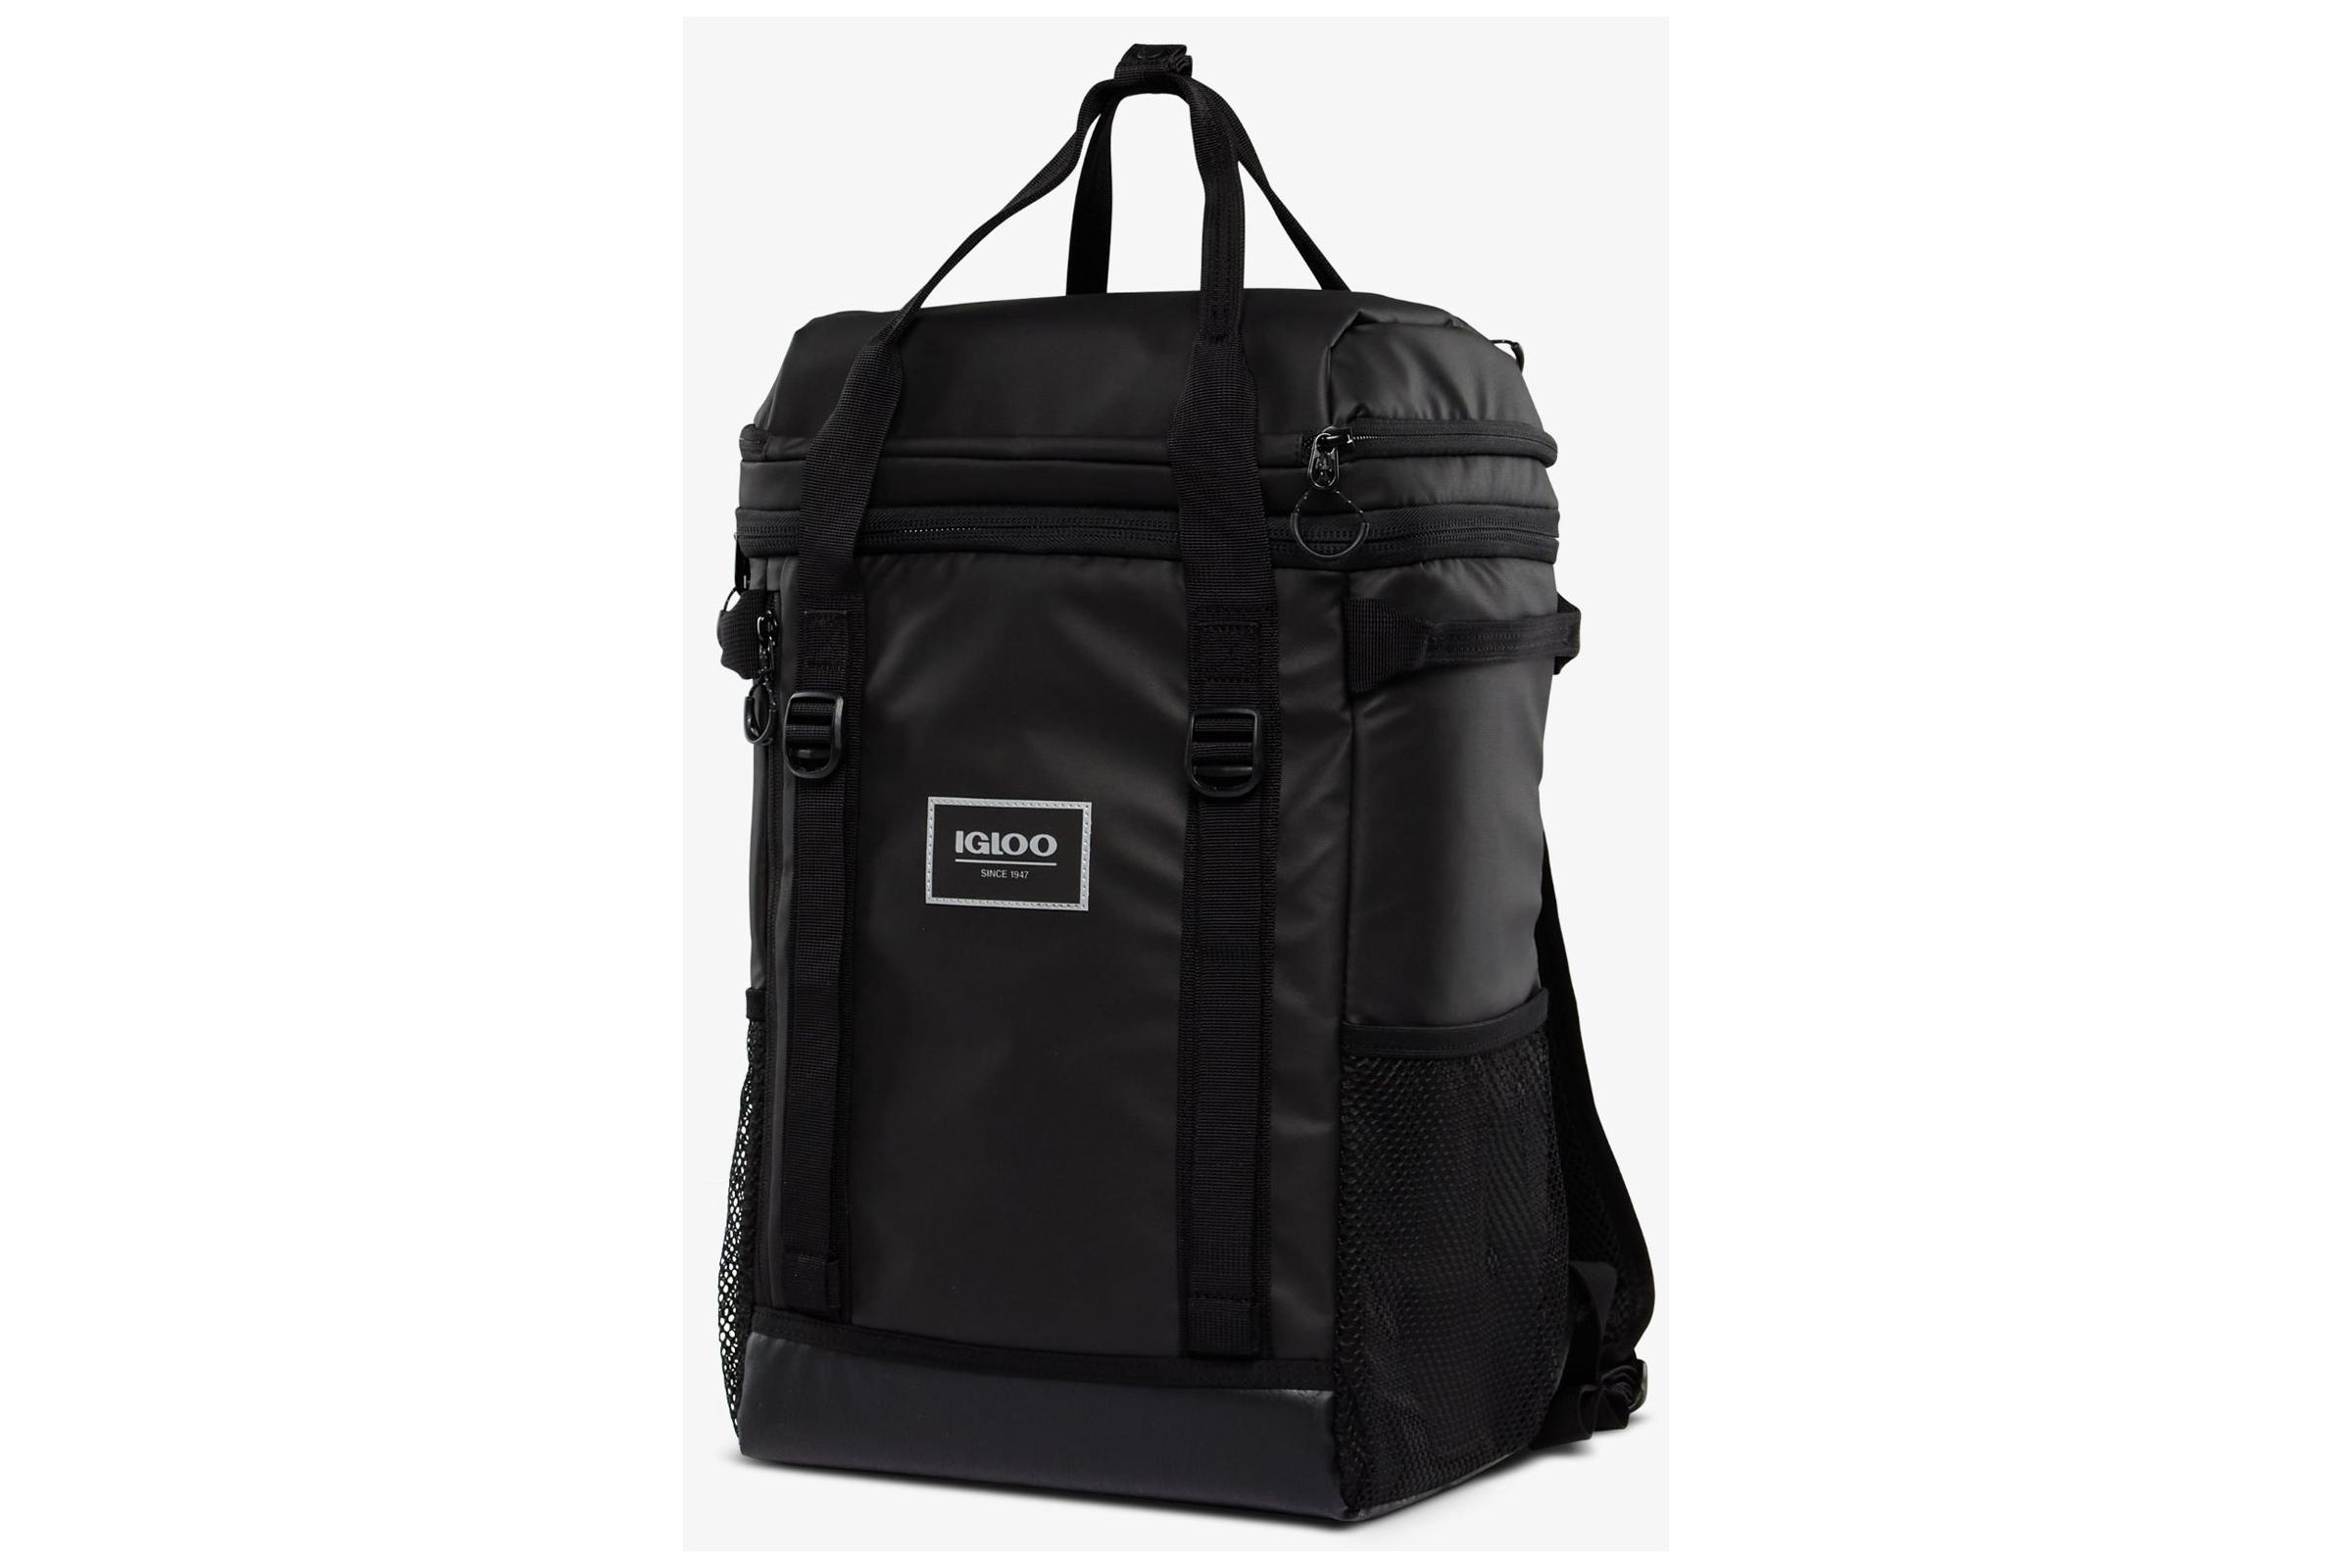 igloo pursuit backpack